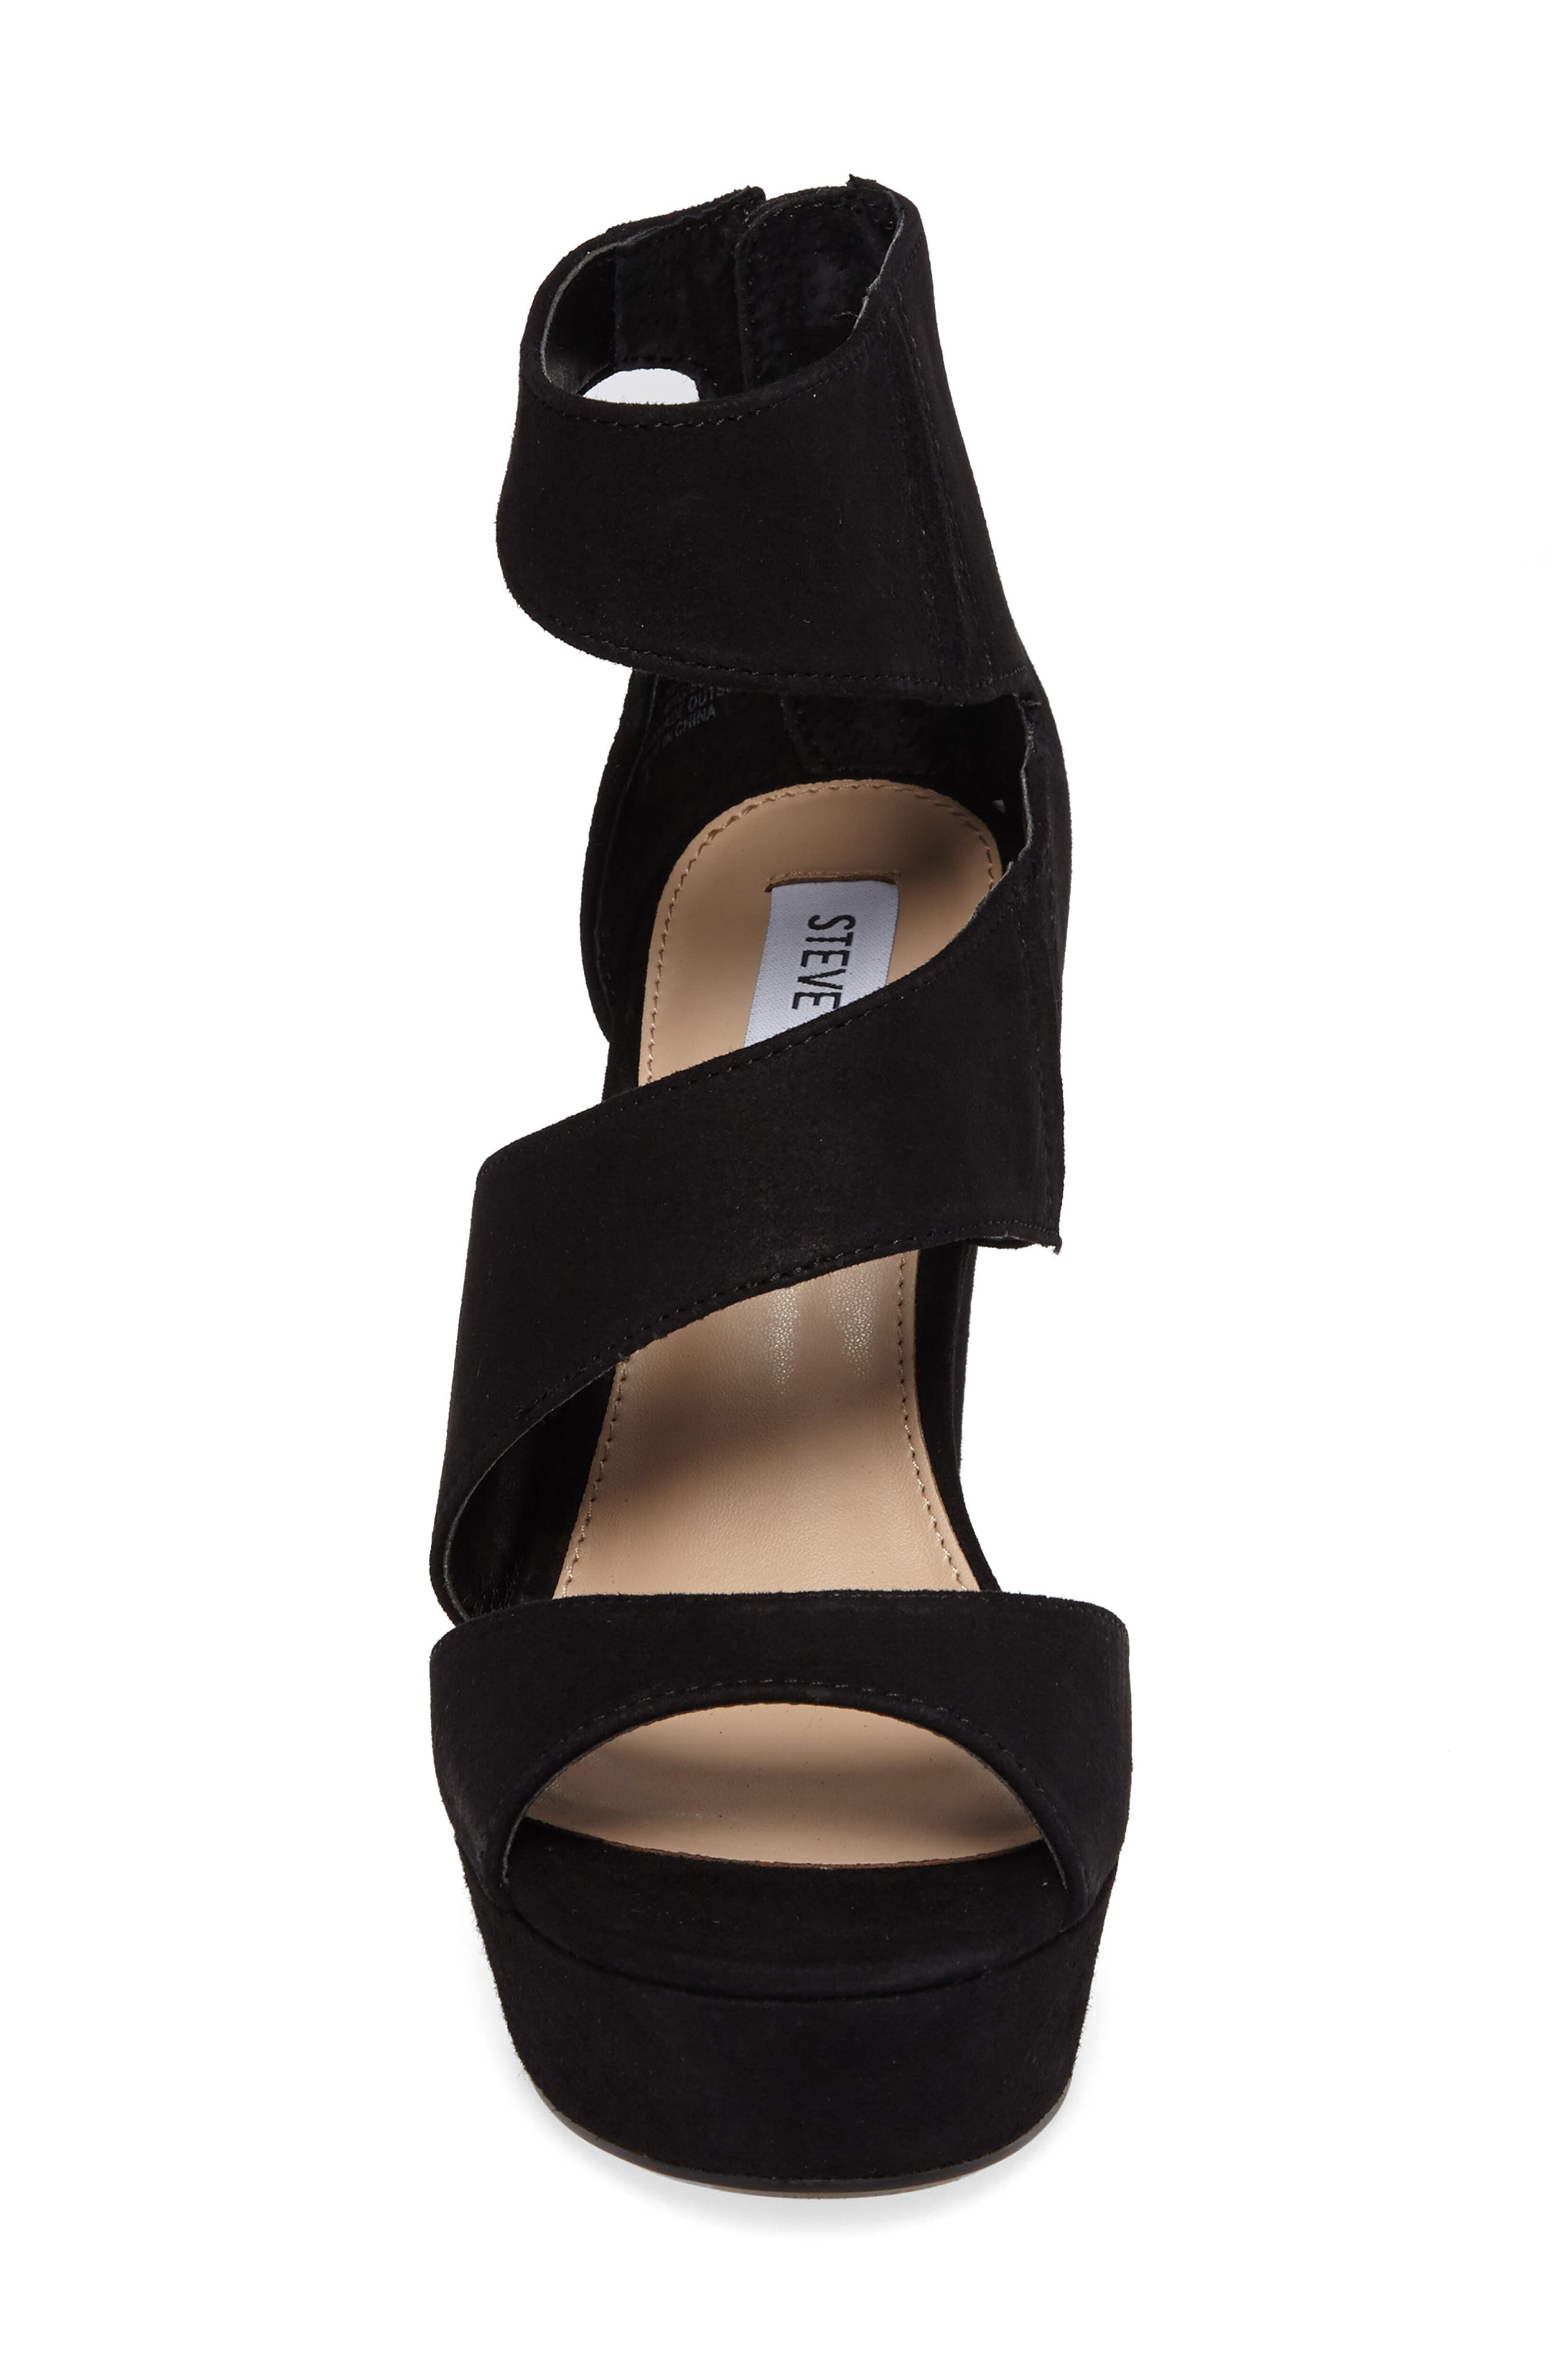 Essey Asymmetrical Platform Wedge Sandal,                             Alternate thumbnail 4, color,                             006